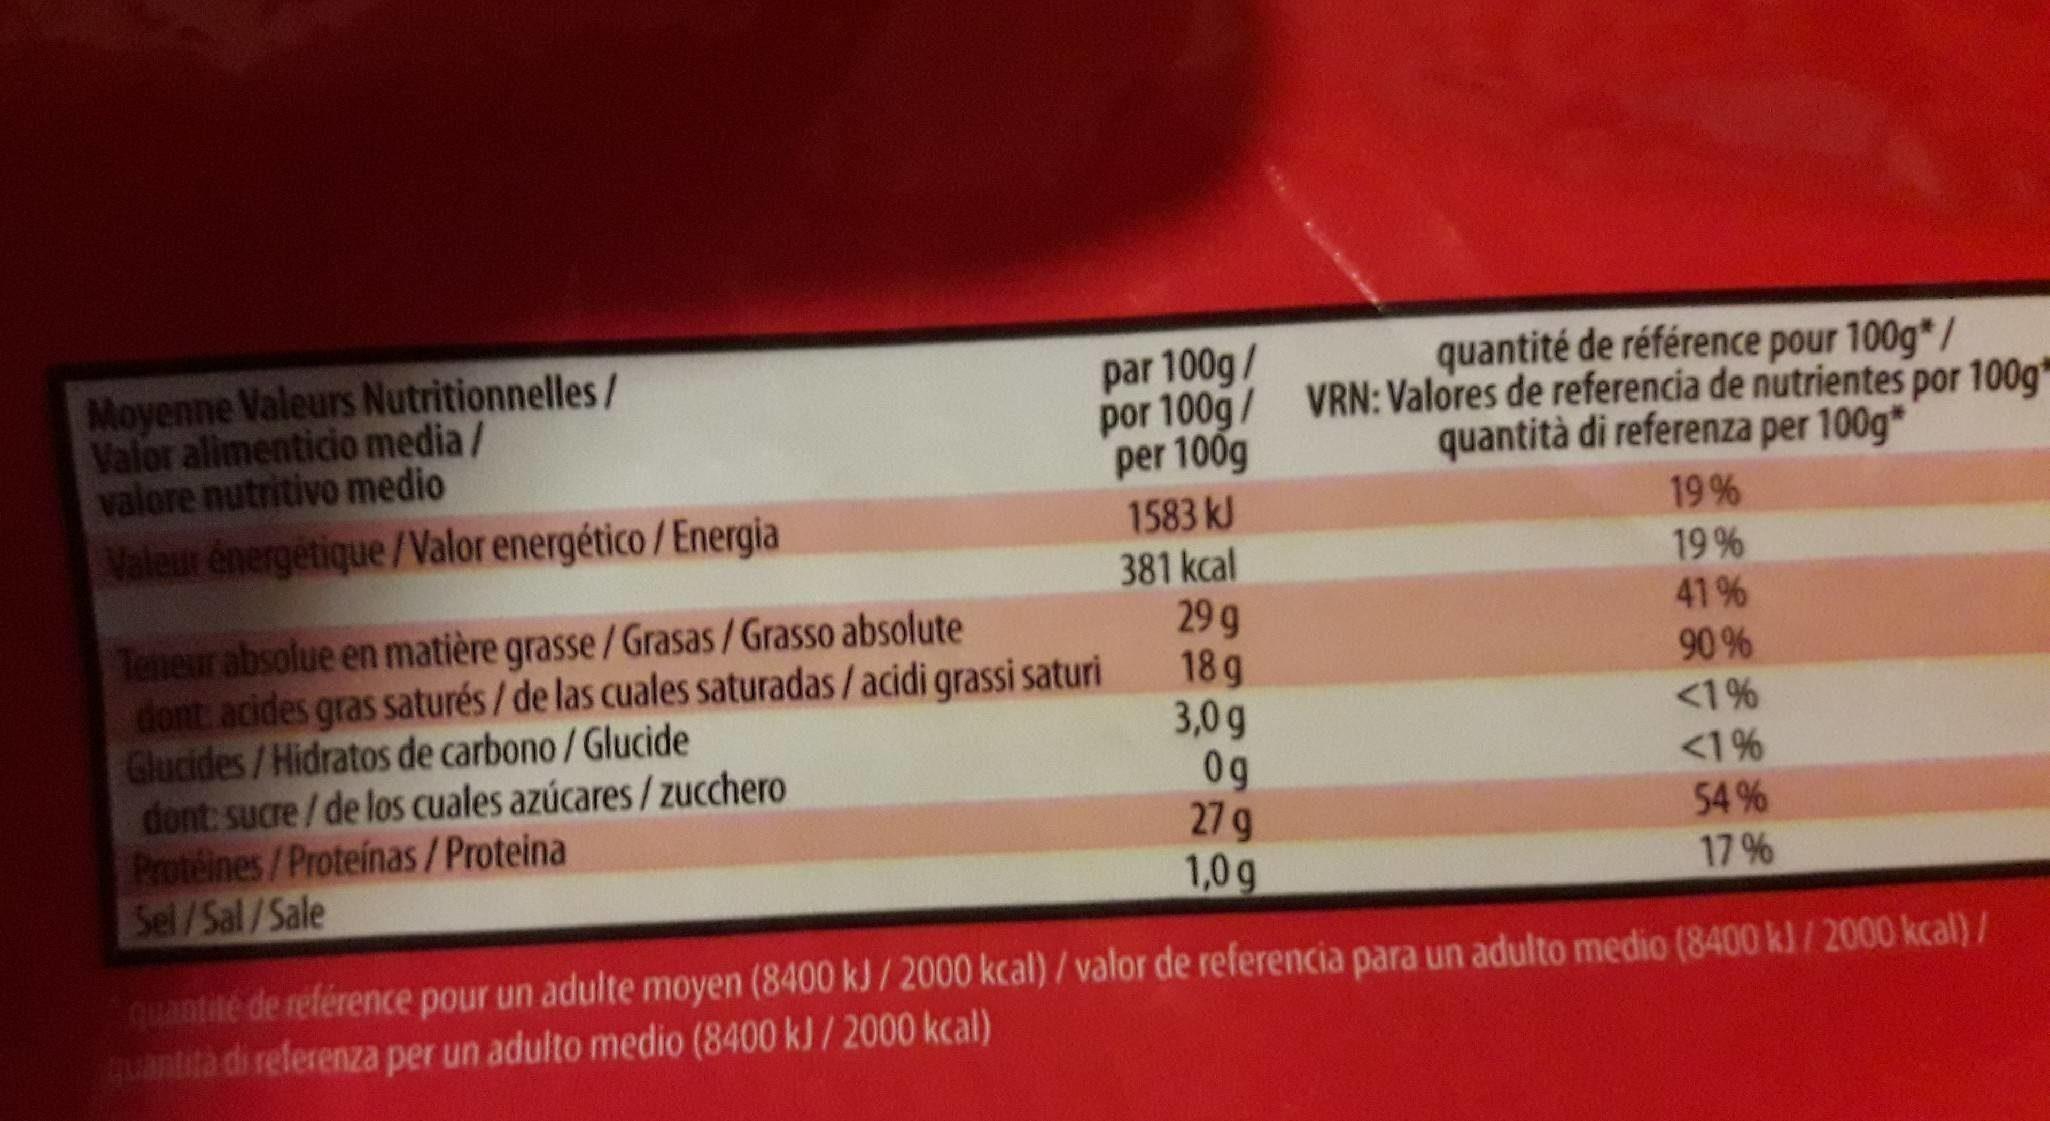 Emmentaler Râpé Vallée D'Henri 1 KG, 1 Pièce - Nutrition facts - fr